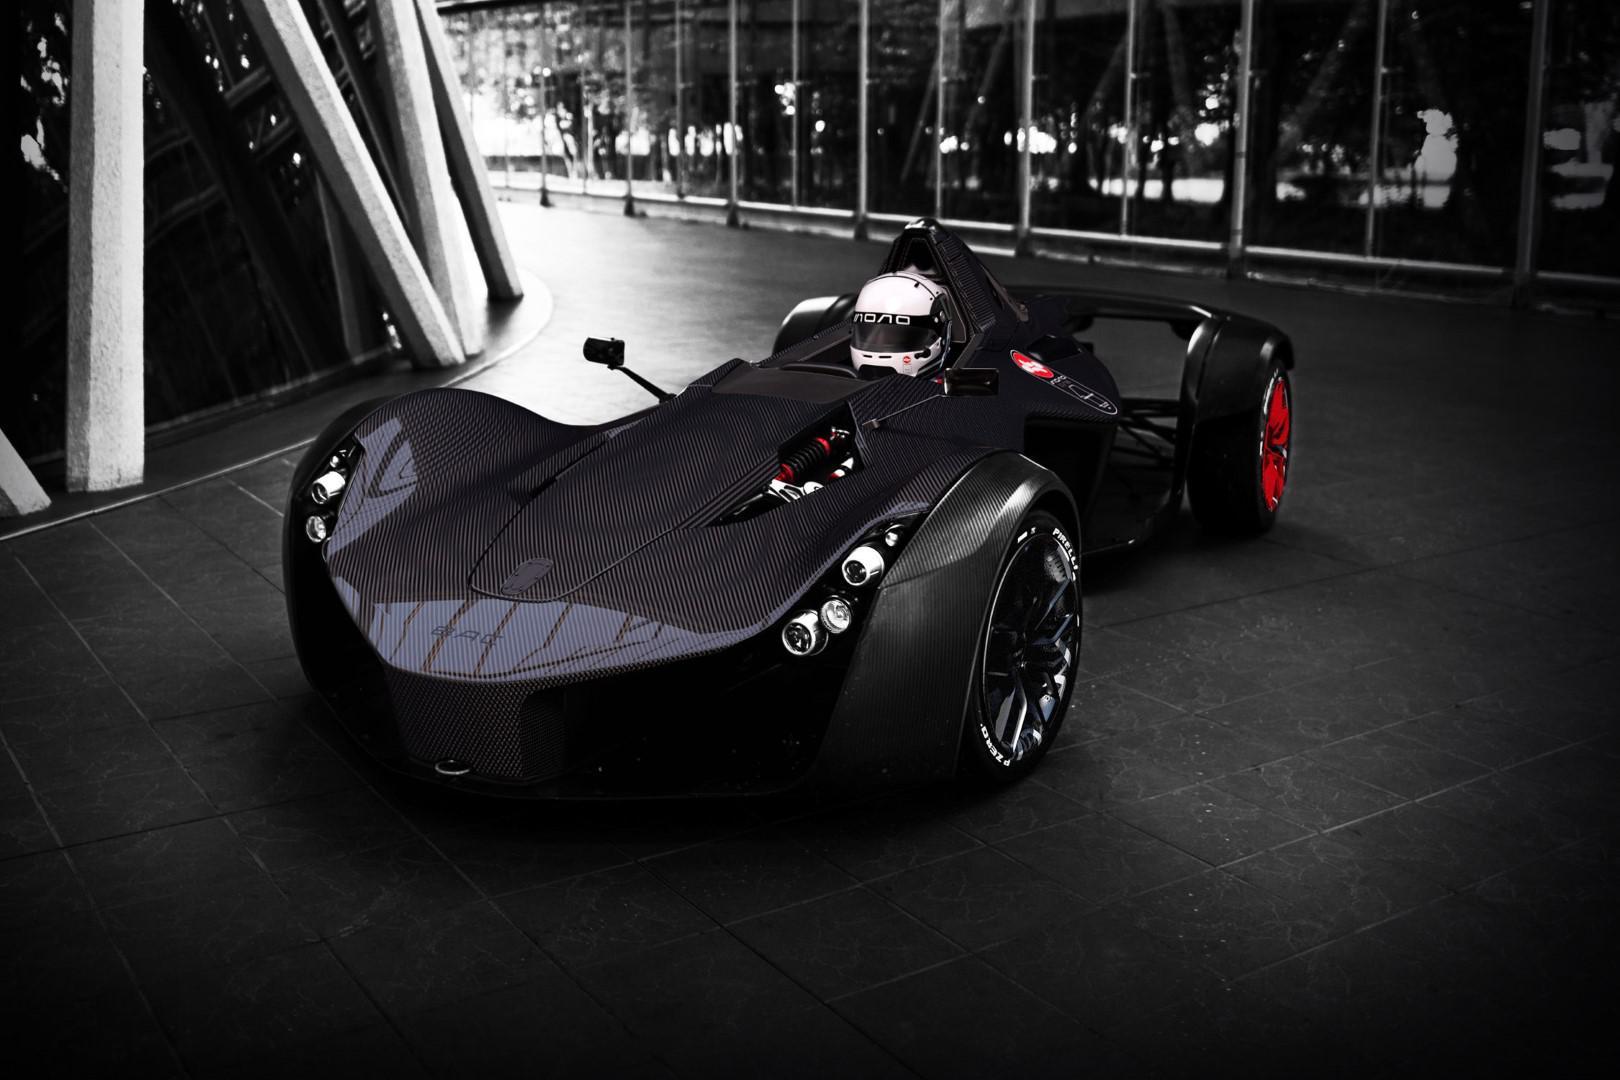 une-edition-limitee-final-edition-de-la-supercar-britannique-bac-mono-one-1192-1.jpg